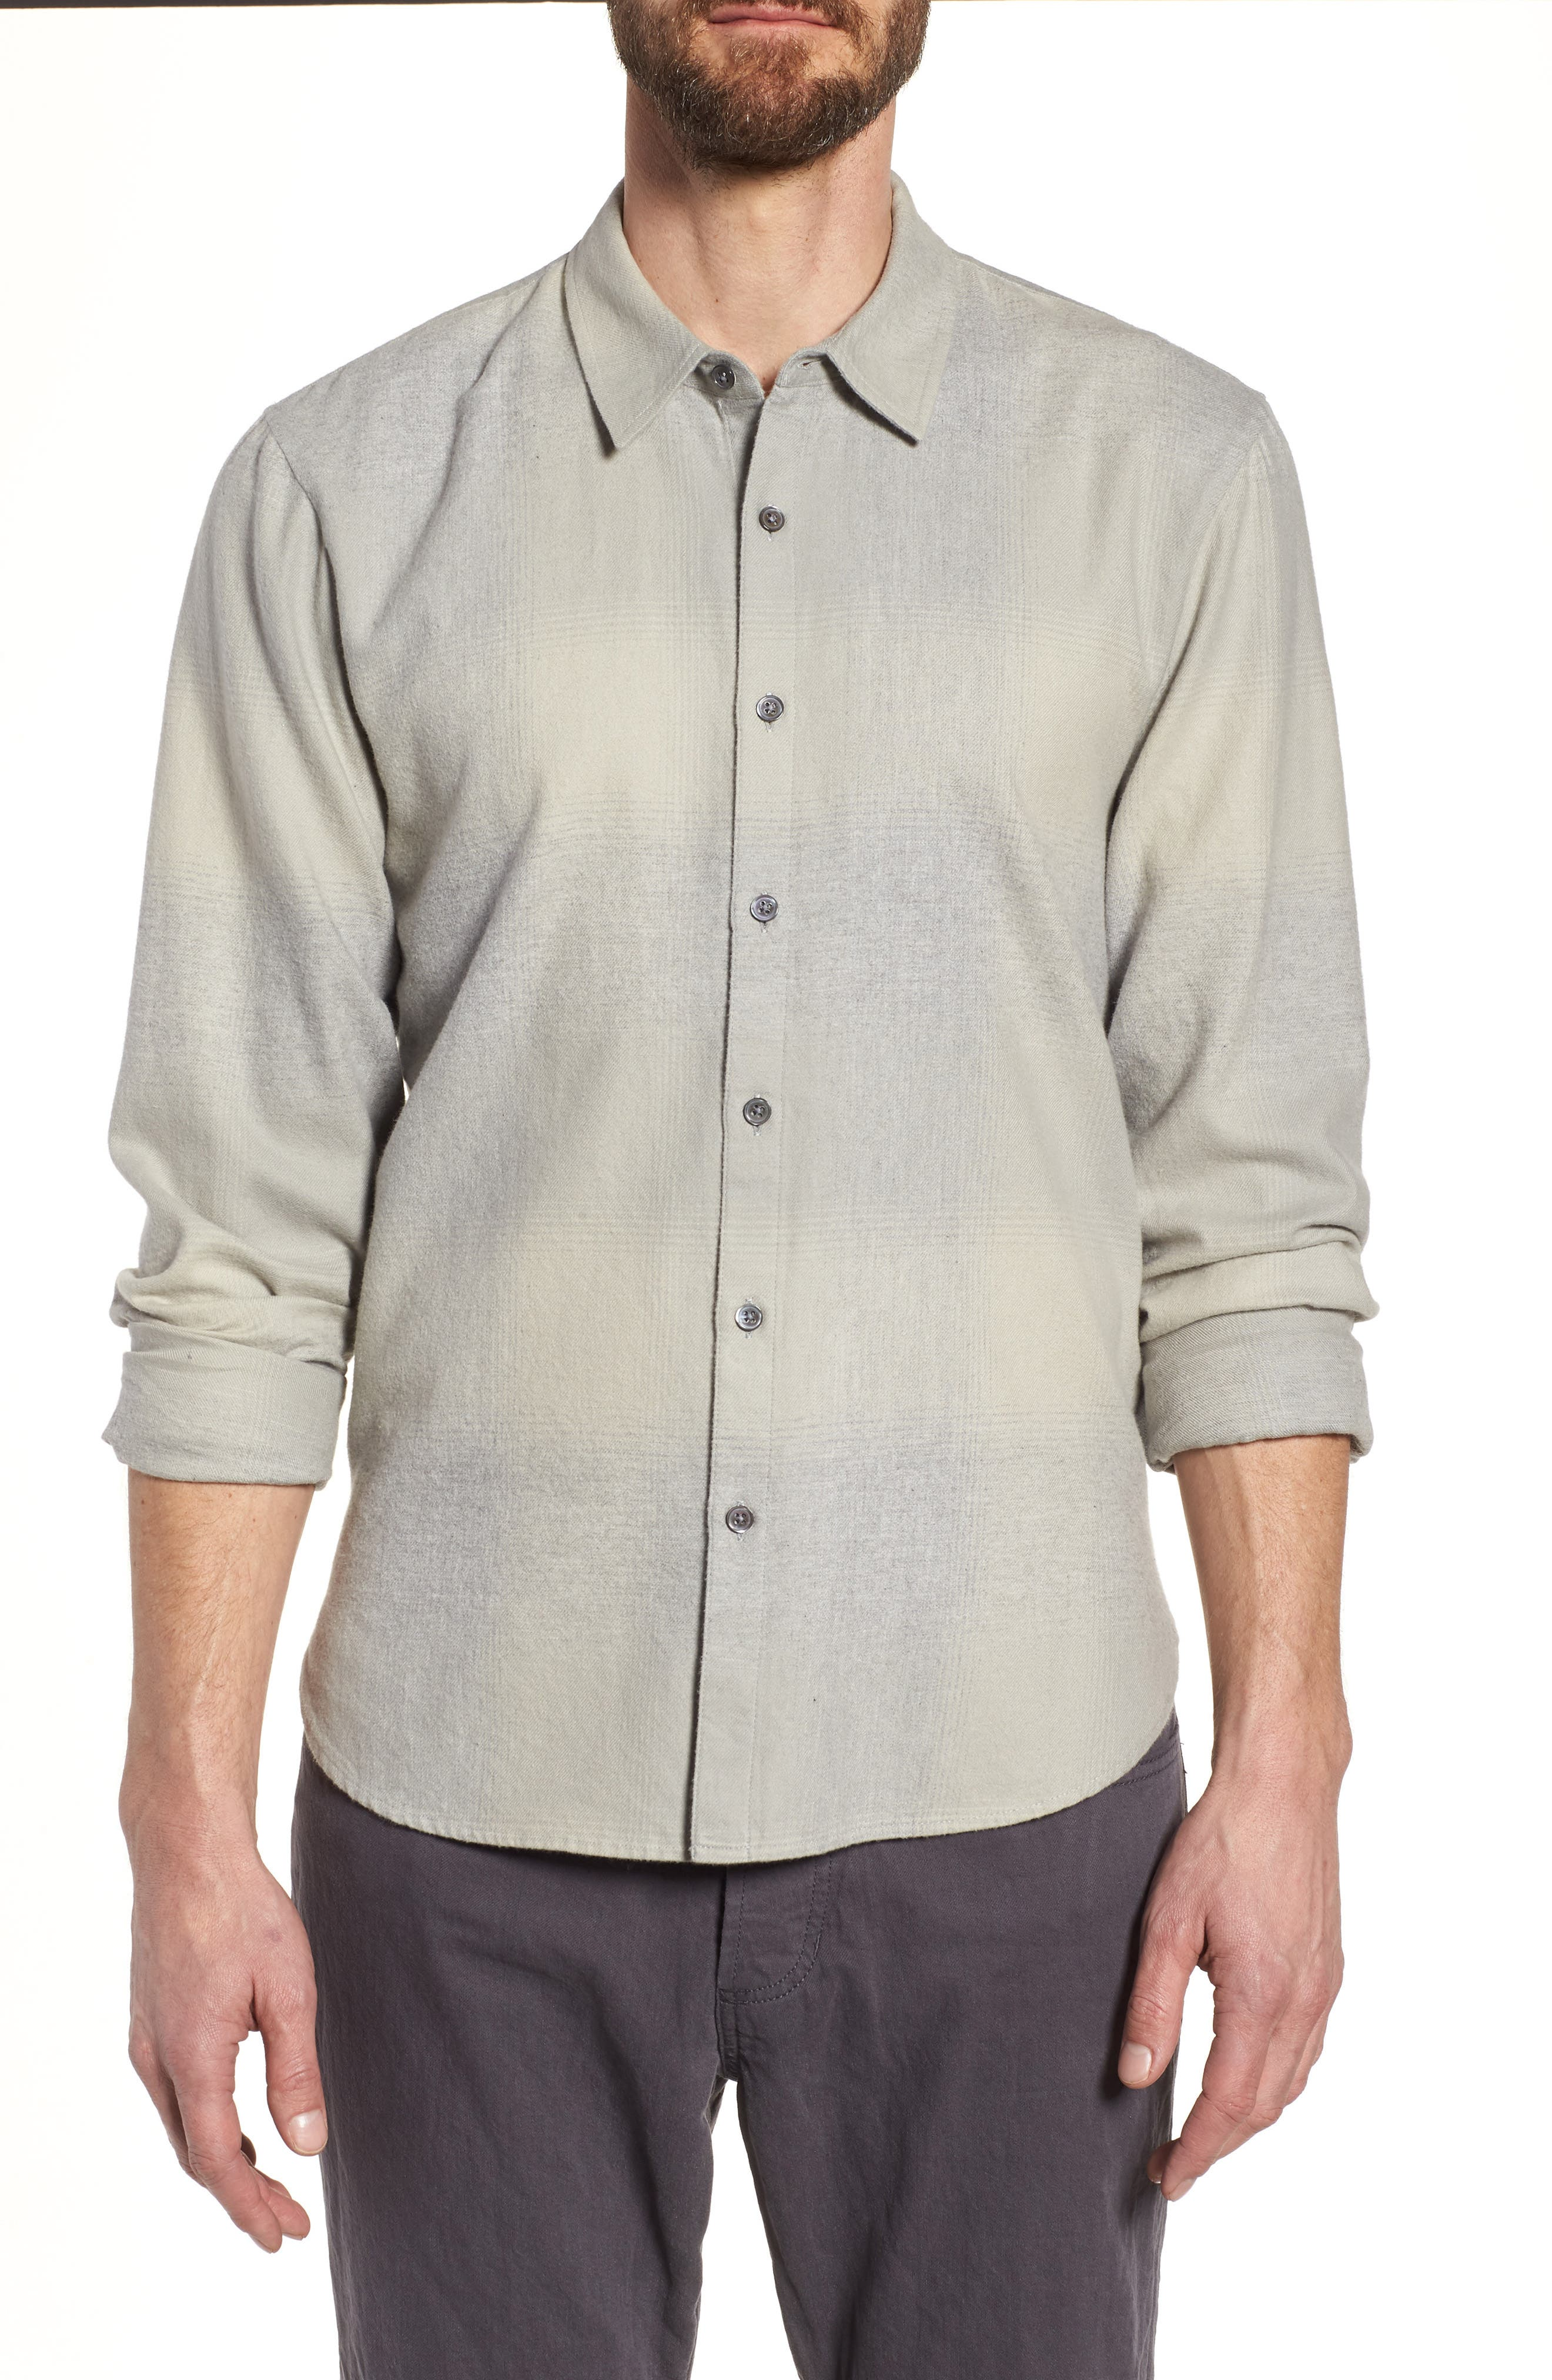 JAMES PERSE Ghost Regular Fit Plaid Sport Shirt, Main, color, 086